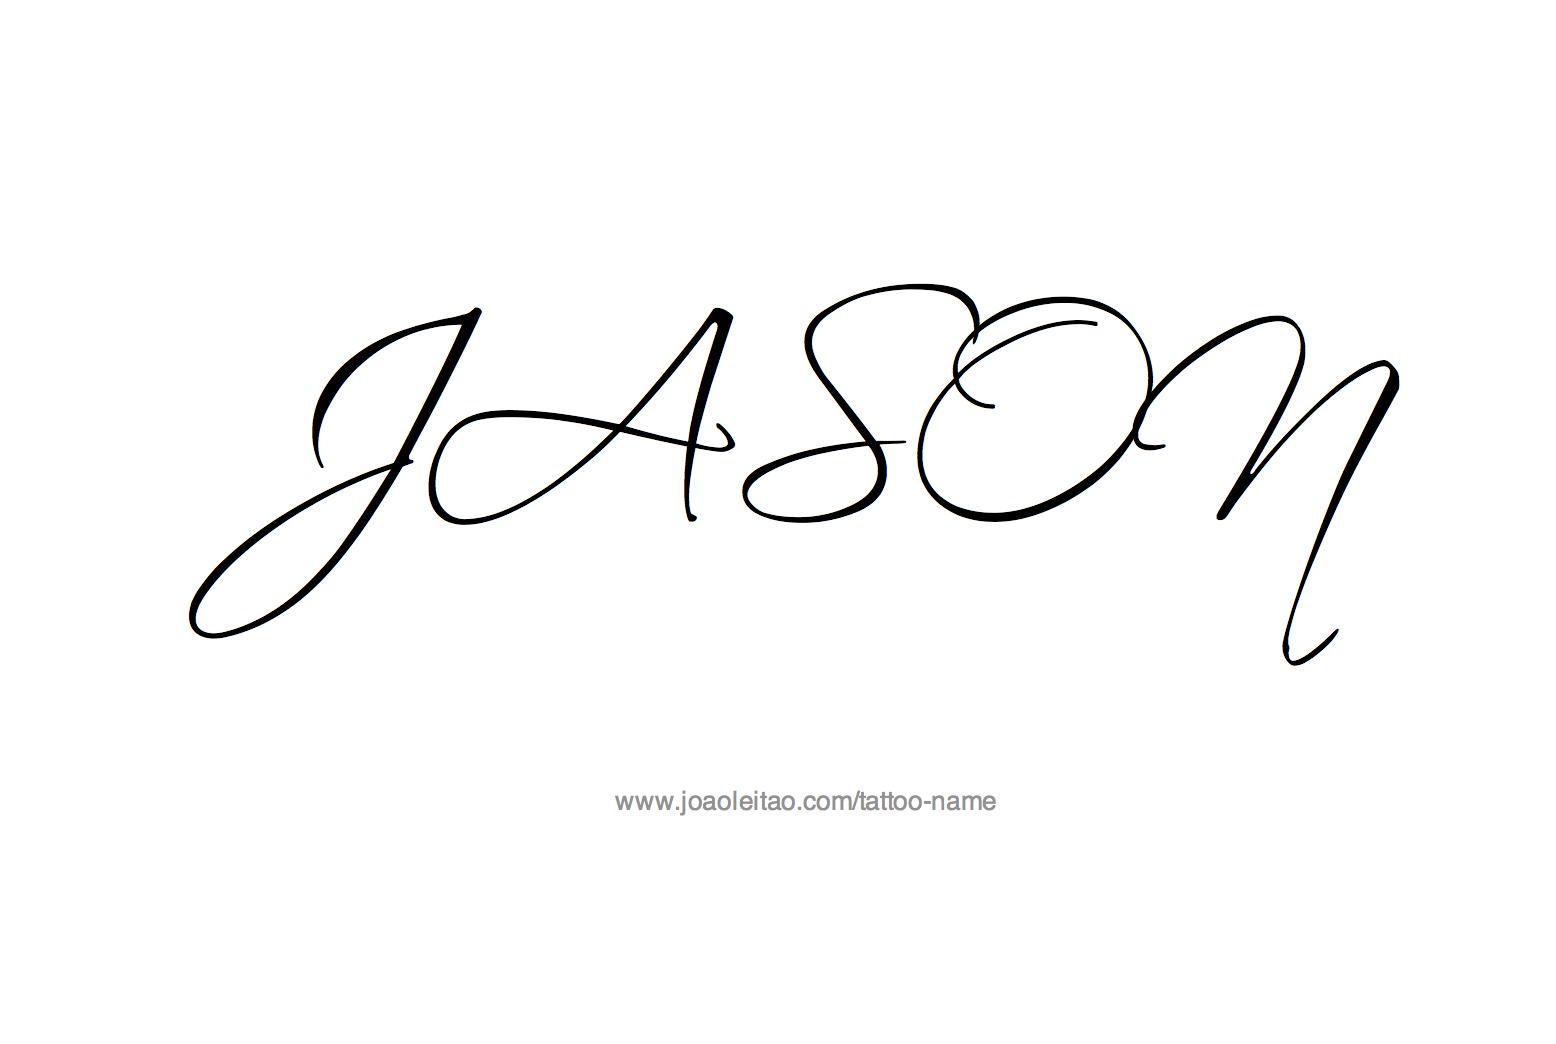 Jason Name Tattoo Designs Name Tattoo Designs Name Tattoo Name Tattoos